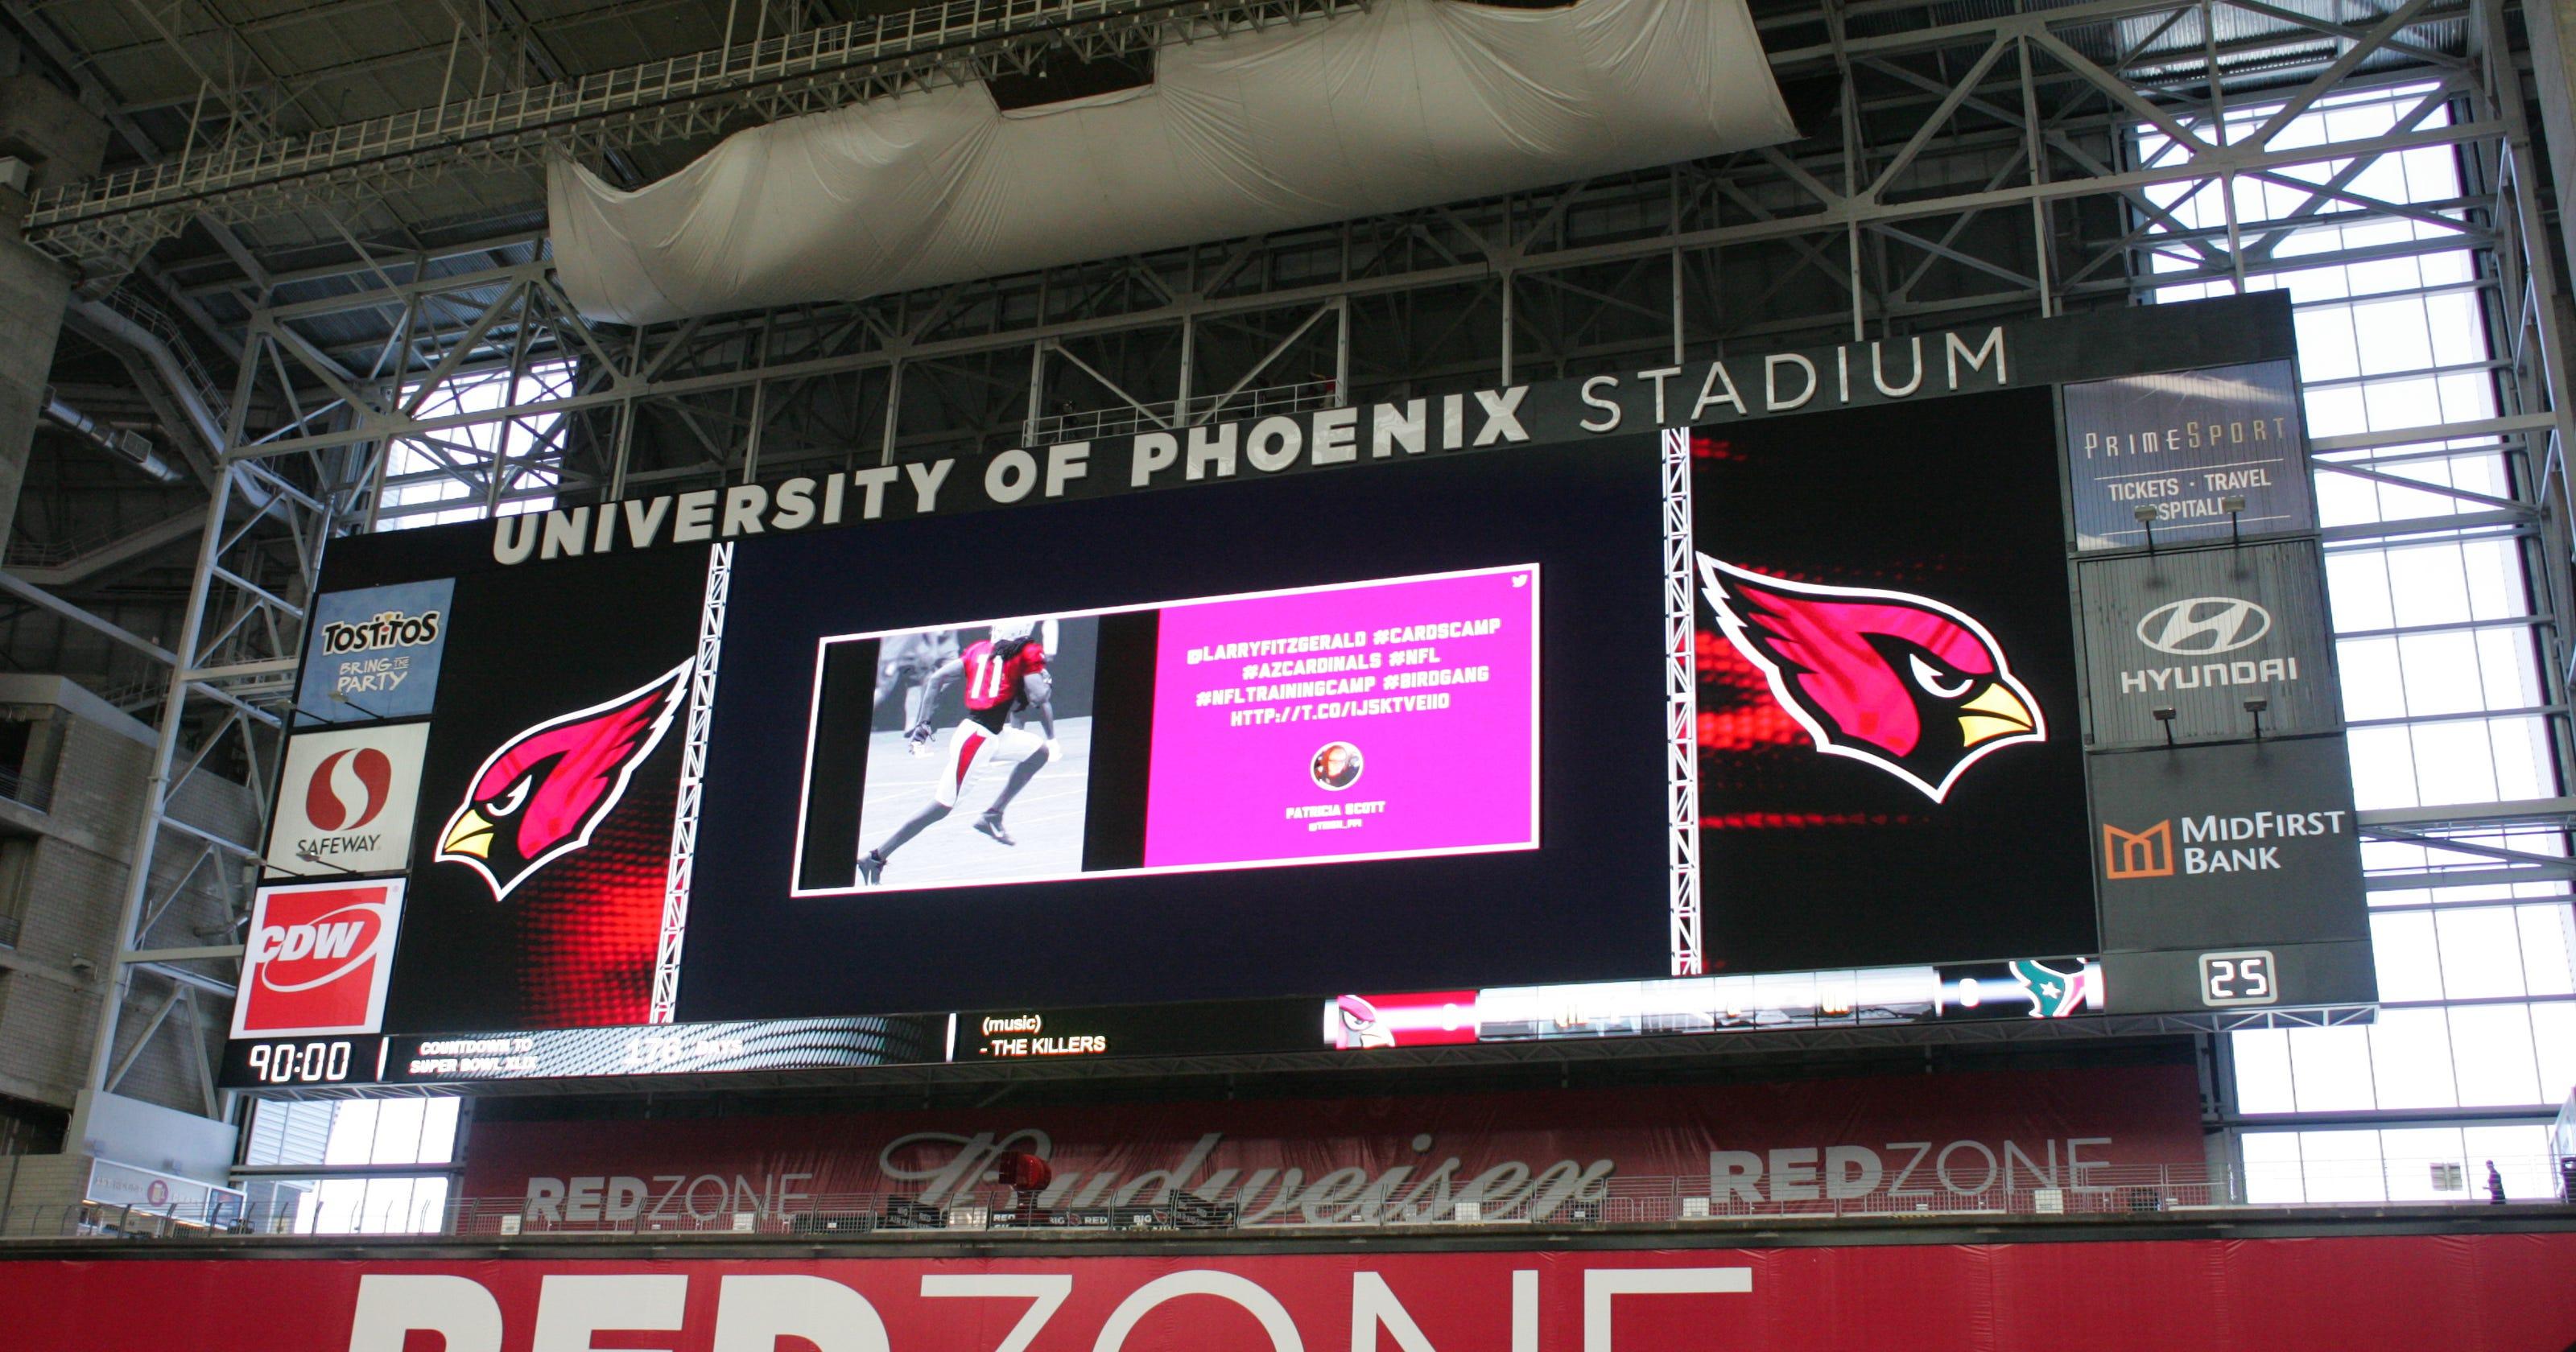 University of Phoenix Stadium gets new big screens 4435793daf5cd